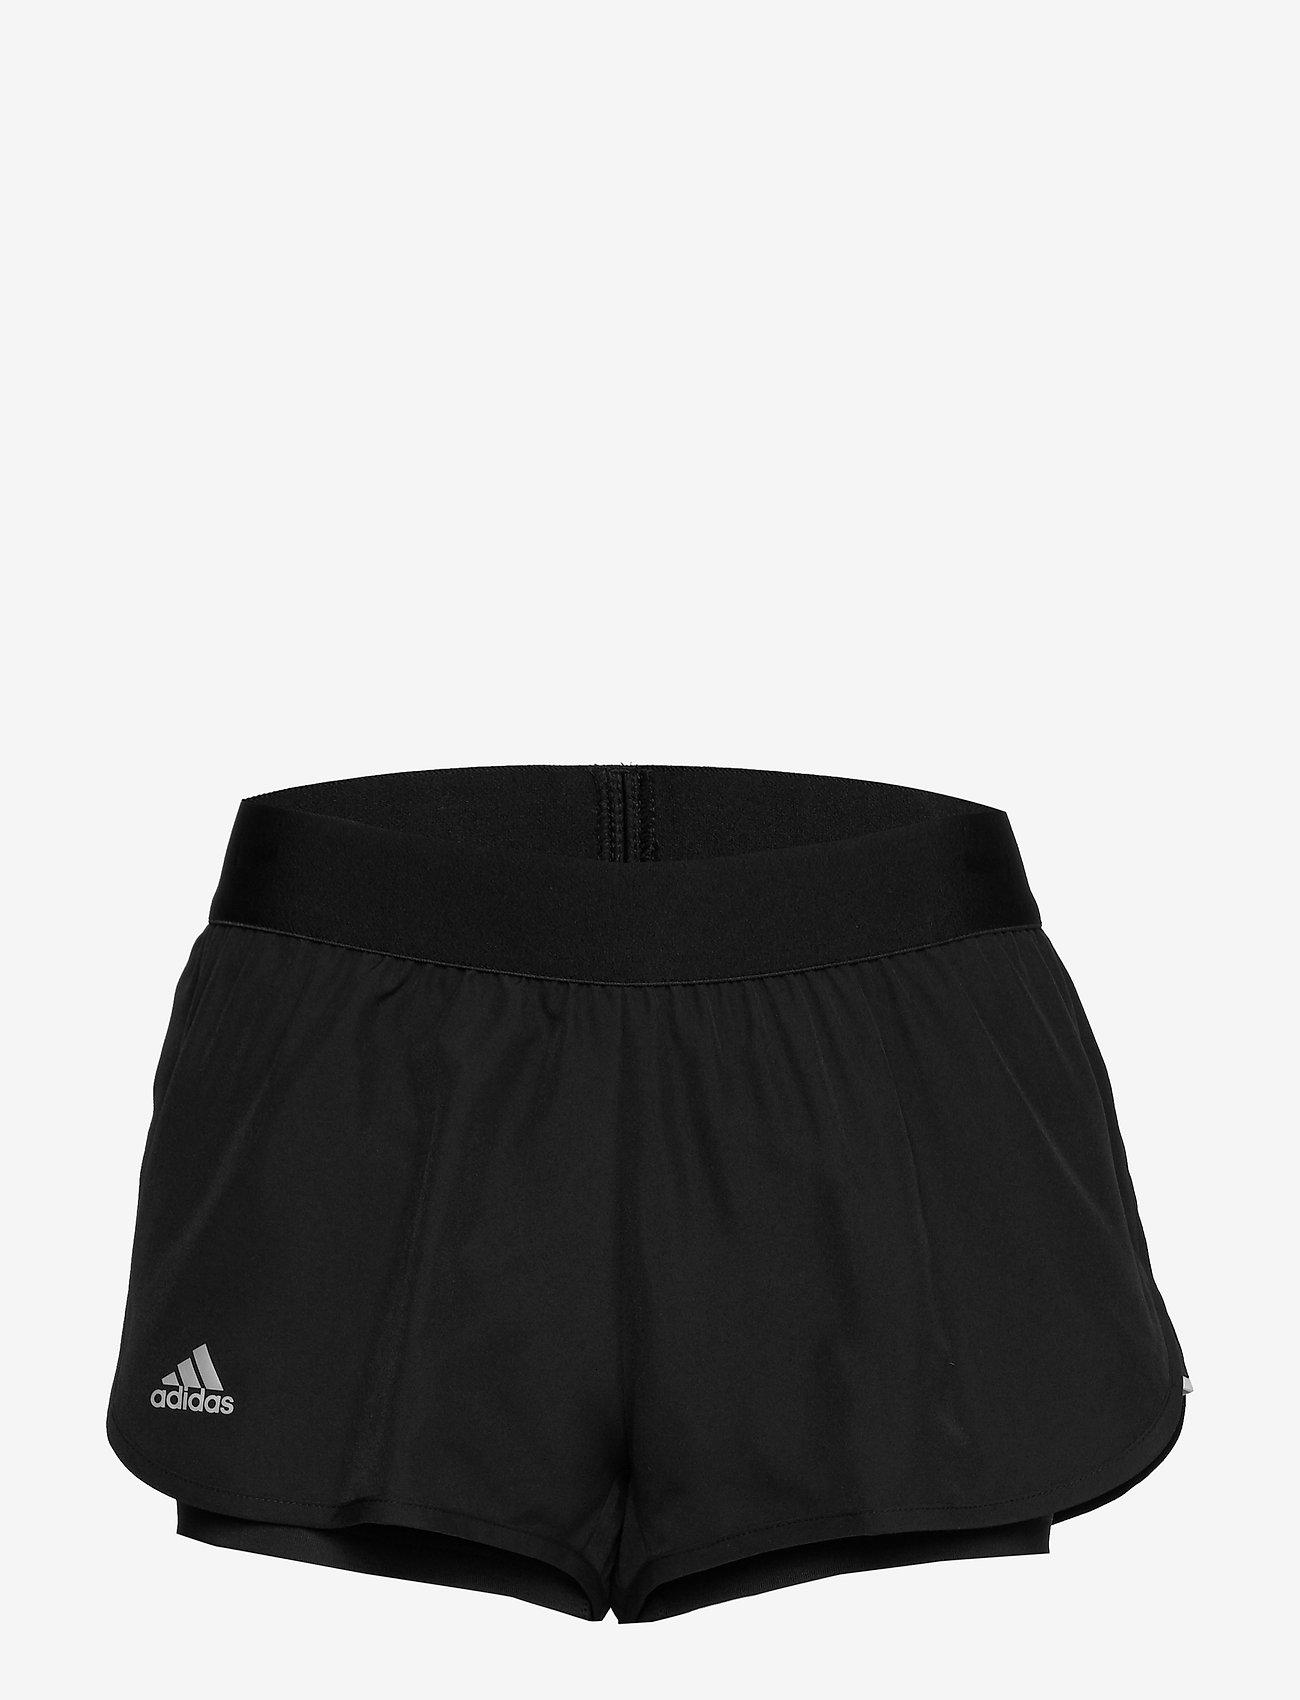 adidas Performance - CLUB SHORT - spodenki treningowe - black - 1